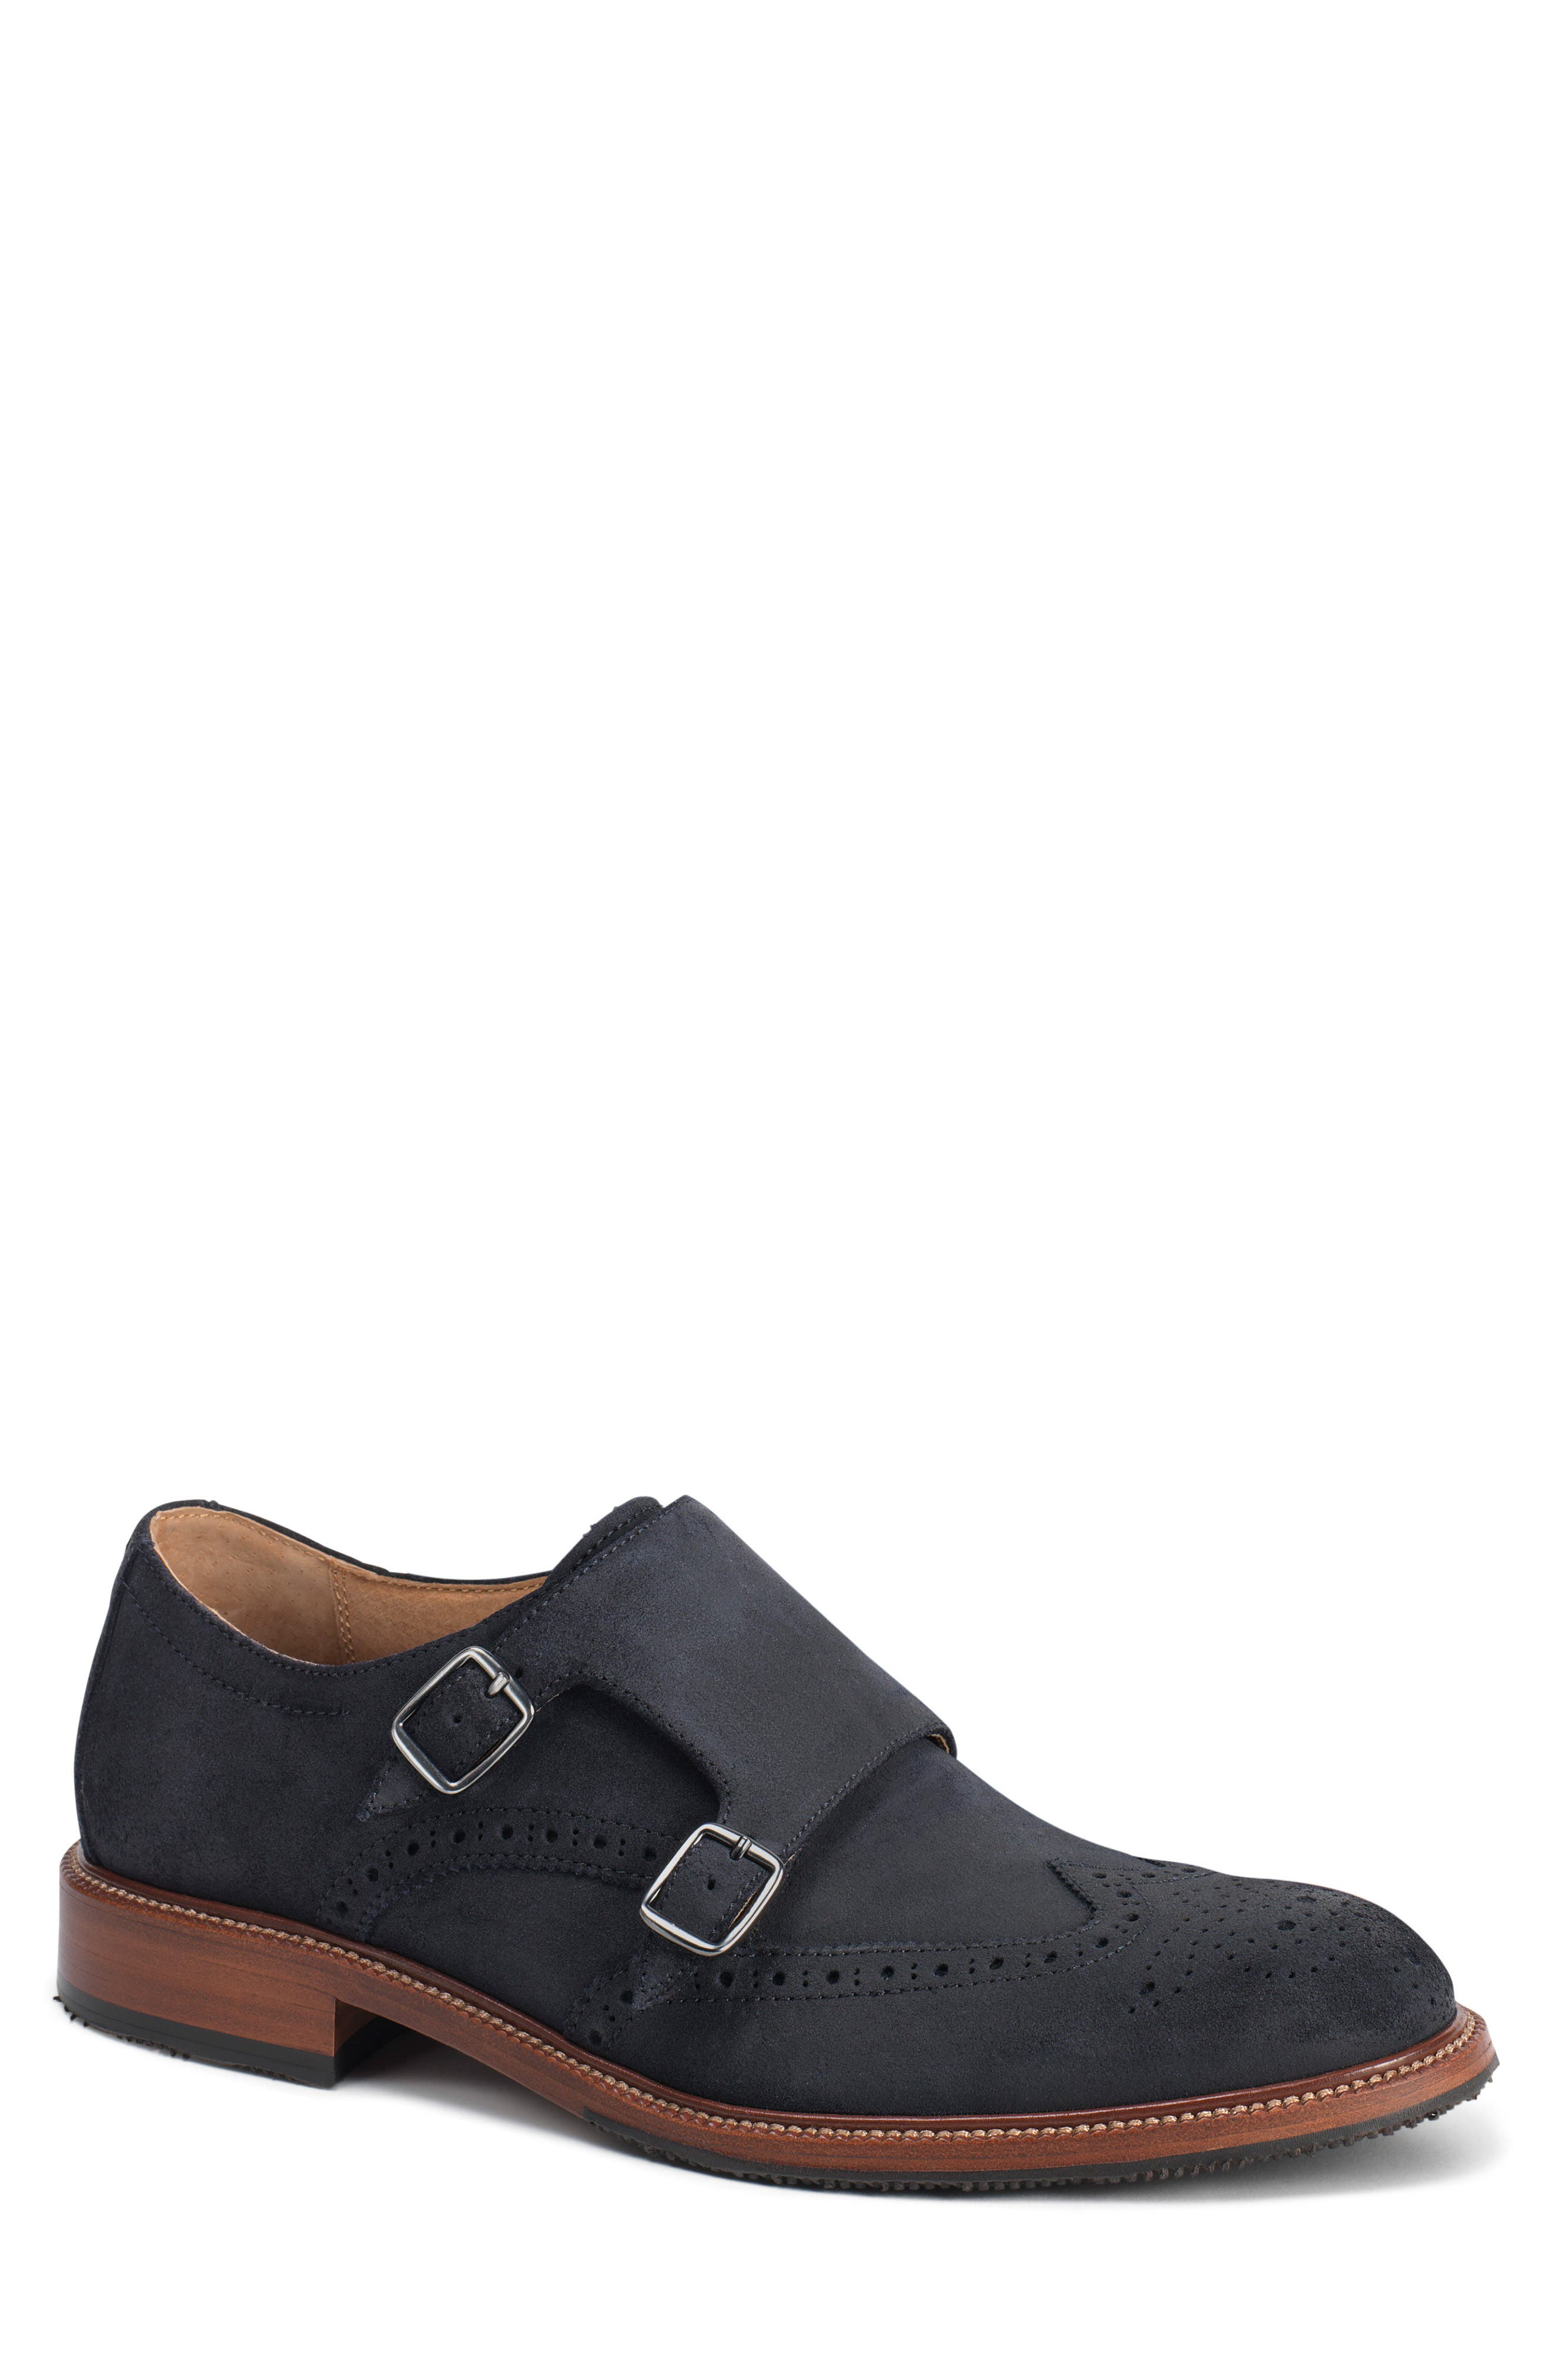 Leland Double Monk Strap Shoe,                             Main thumbnail 1, color,                             Navy Waxed Suede